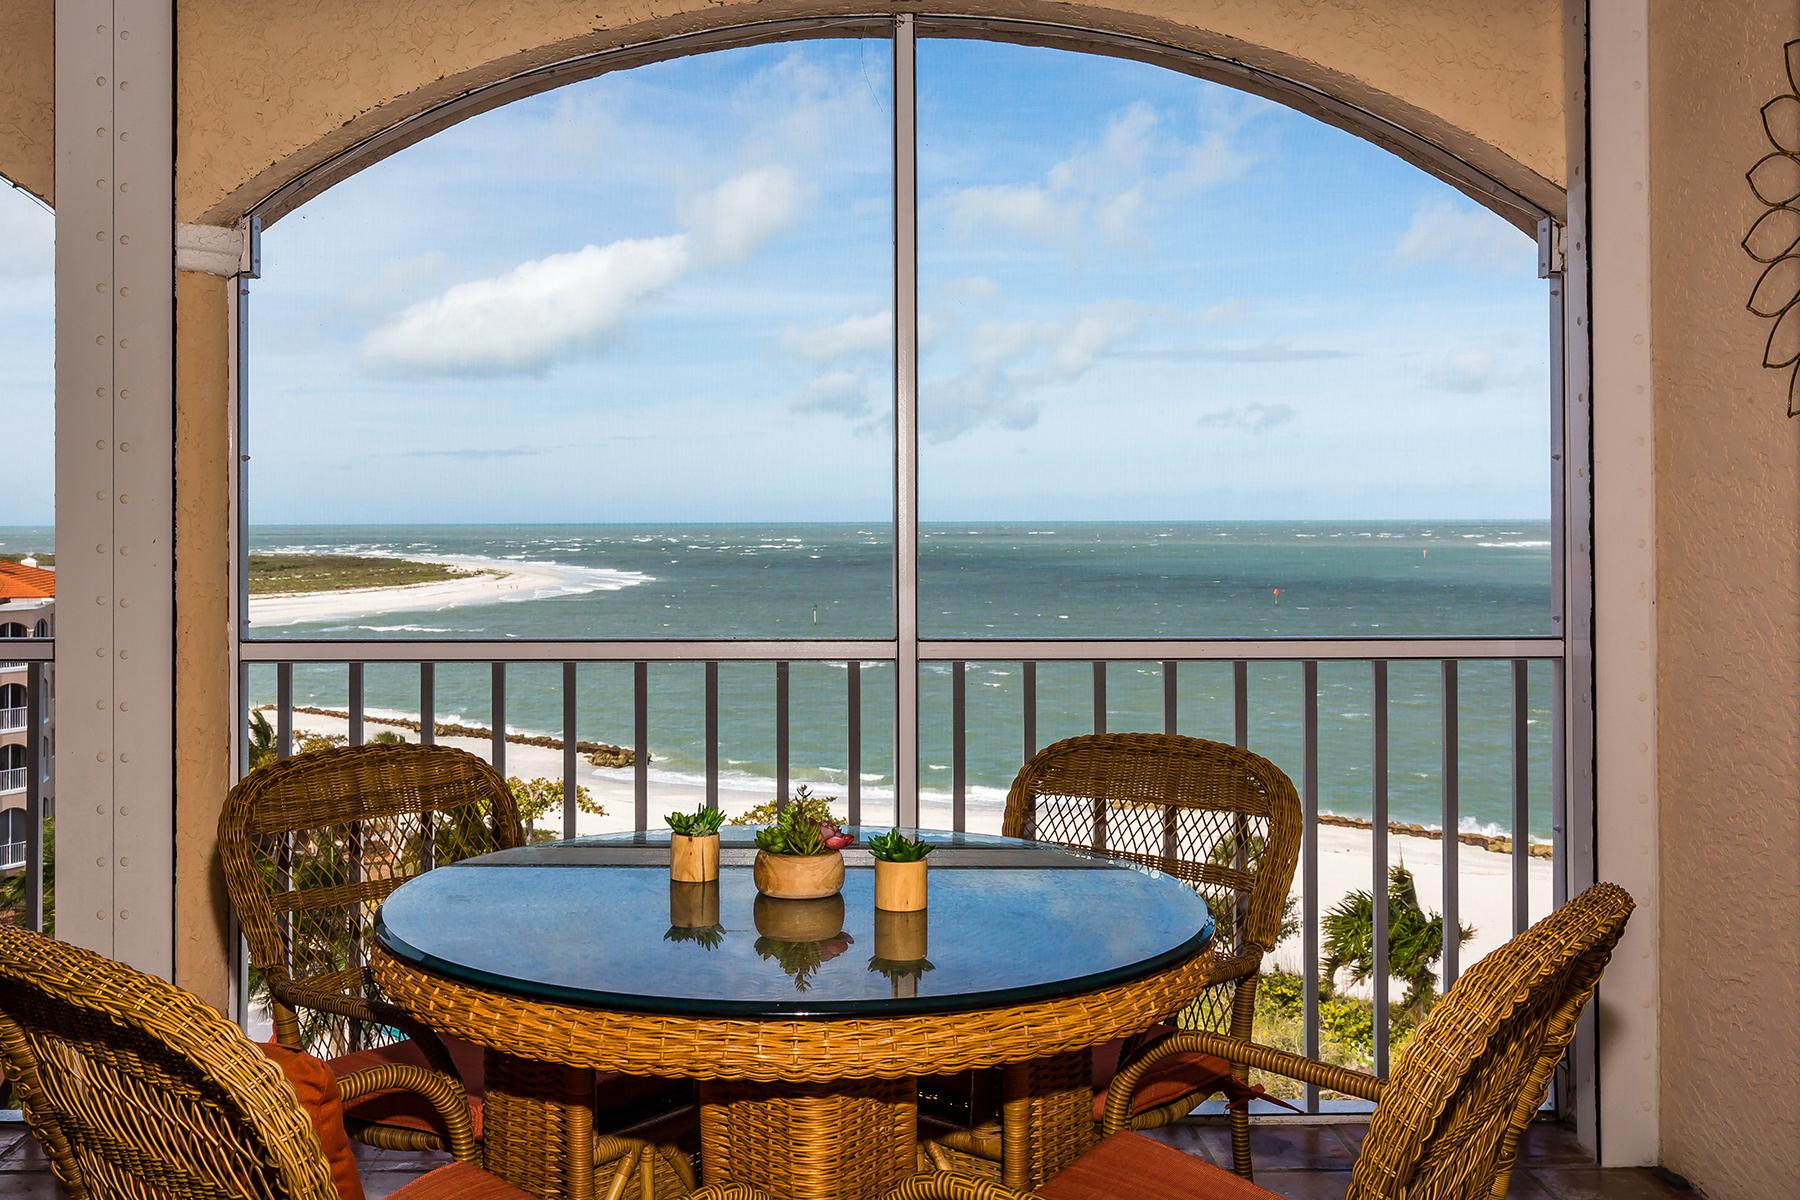 Condomínio para Venda às 3000 Royal Marco Way , PH-M, Marco Island, FL 3414 3000 Royal Marco Way PH-M Marco Island, Florida, 34145 Estados Unidos